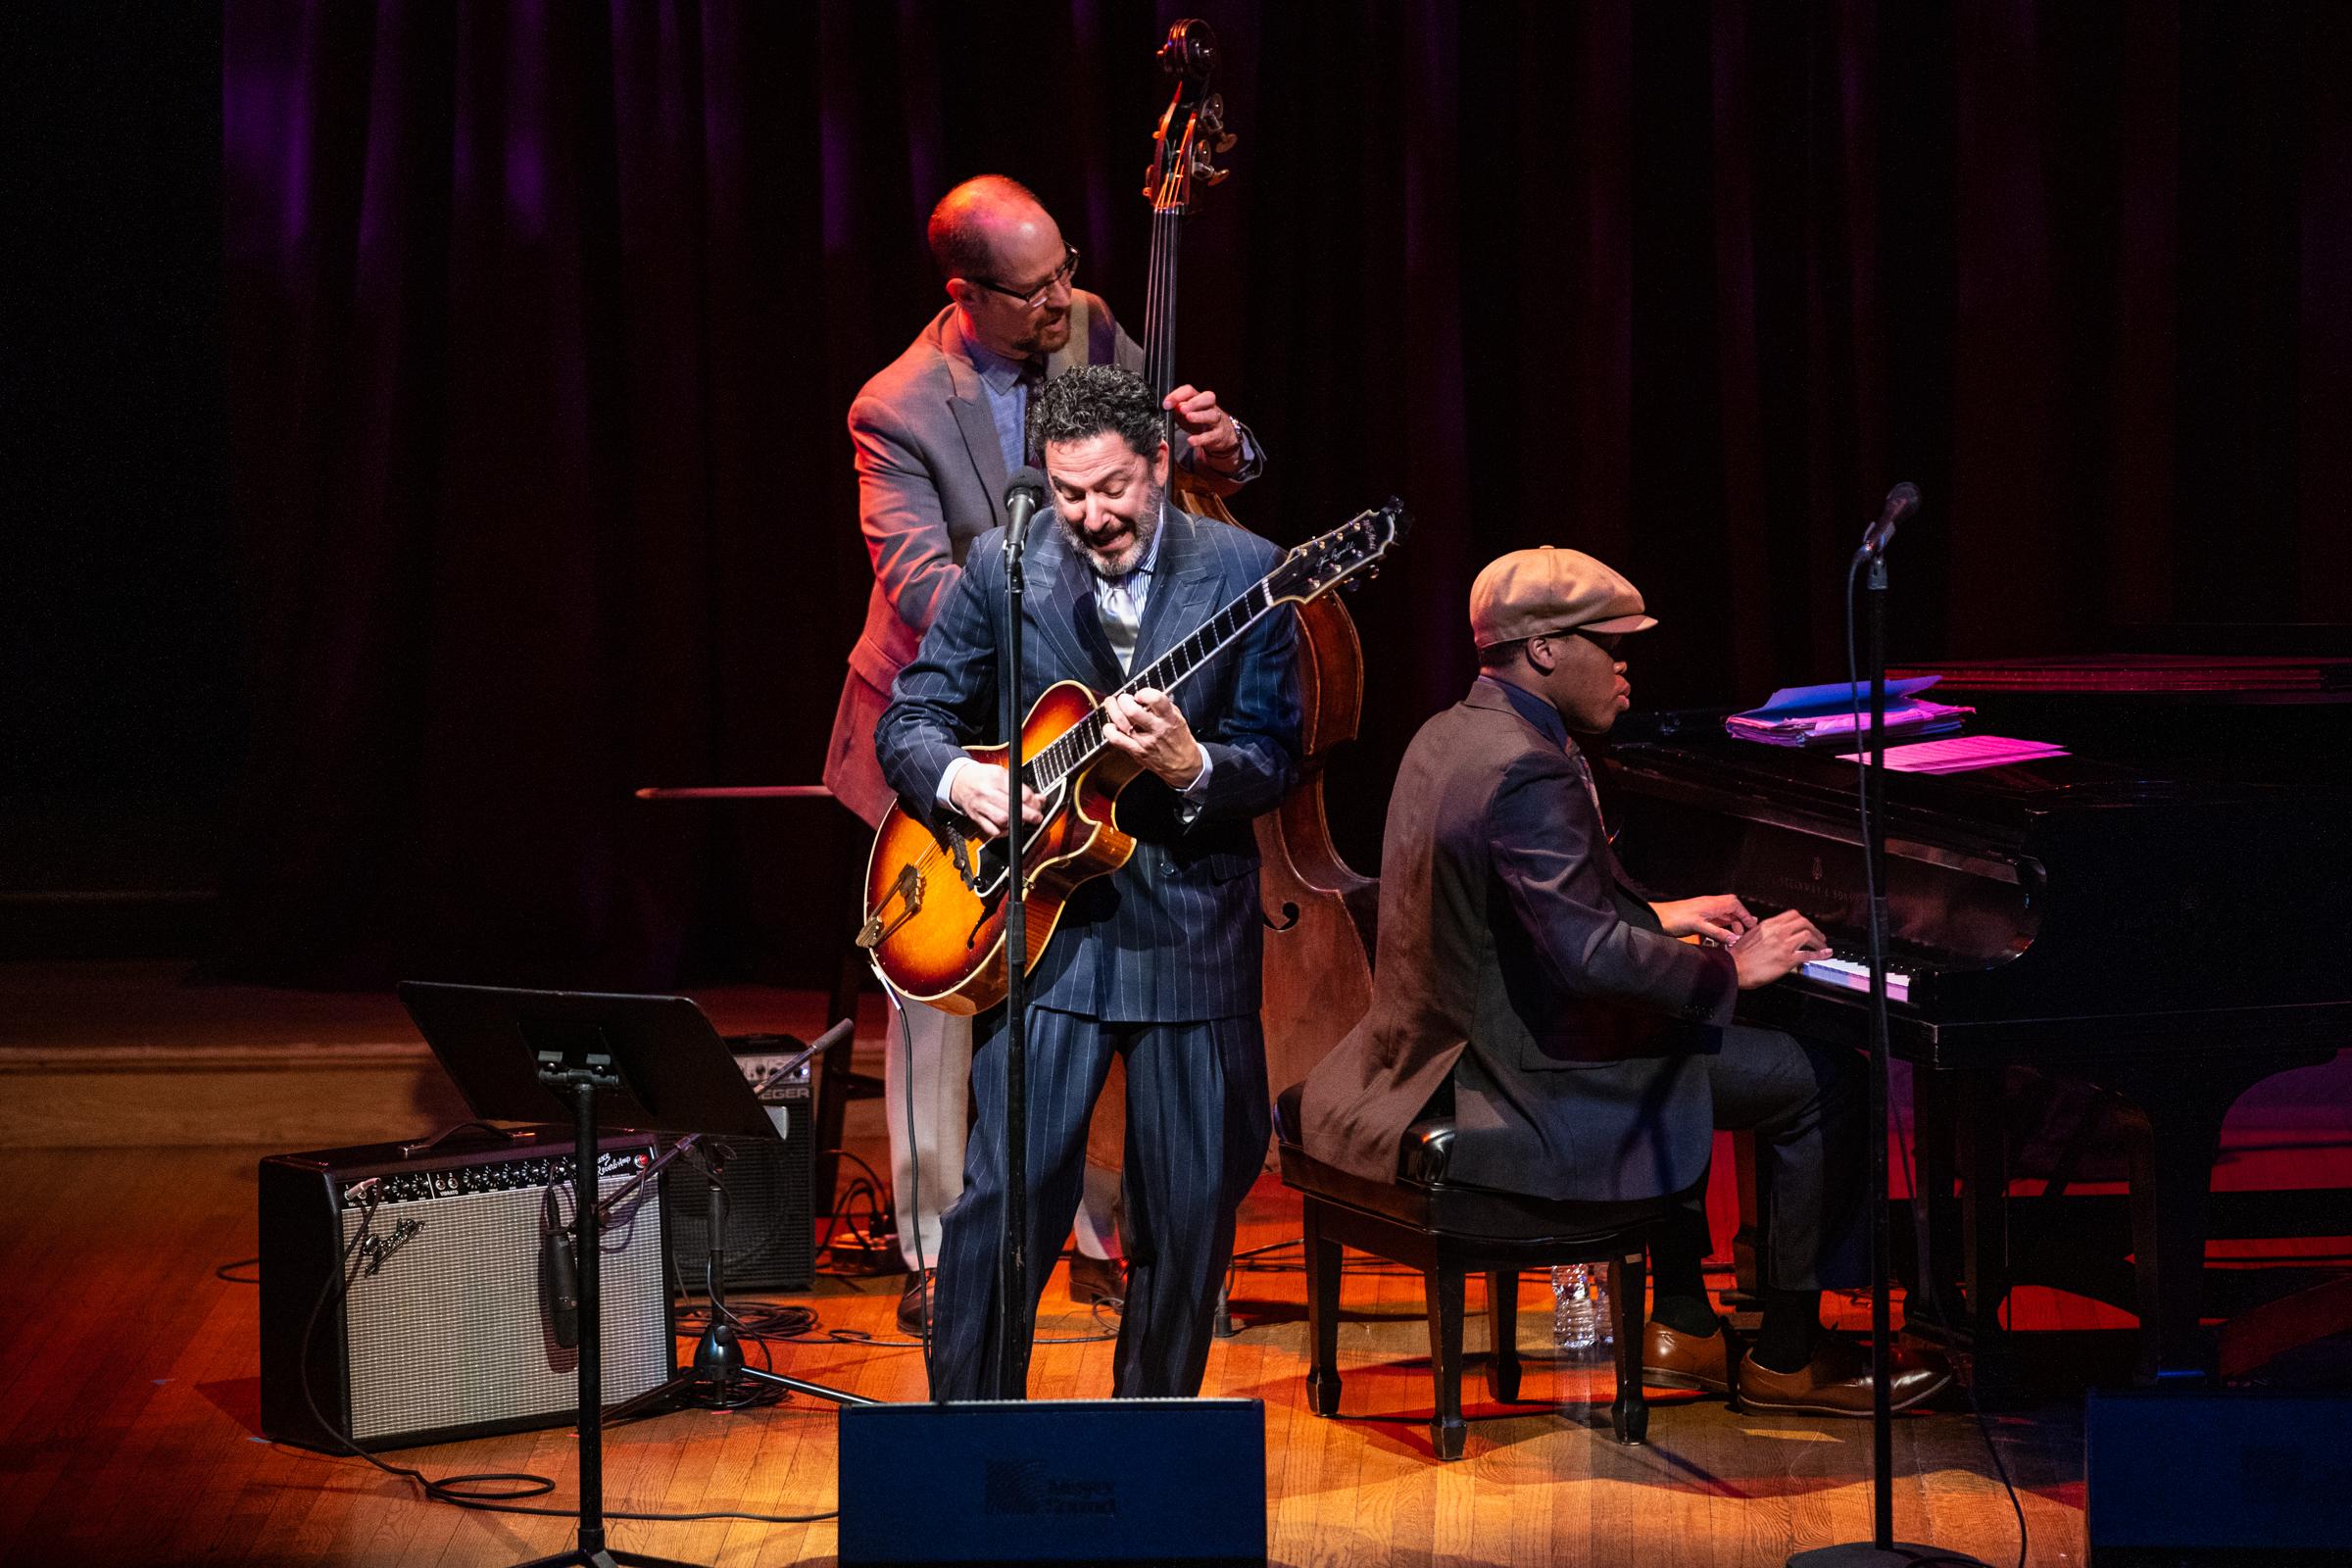 Celebrity Series of Boston presented the John Pizzarelli Trio and Veronica Swift at Sanders Theatre.